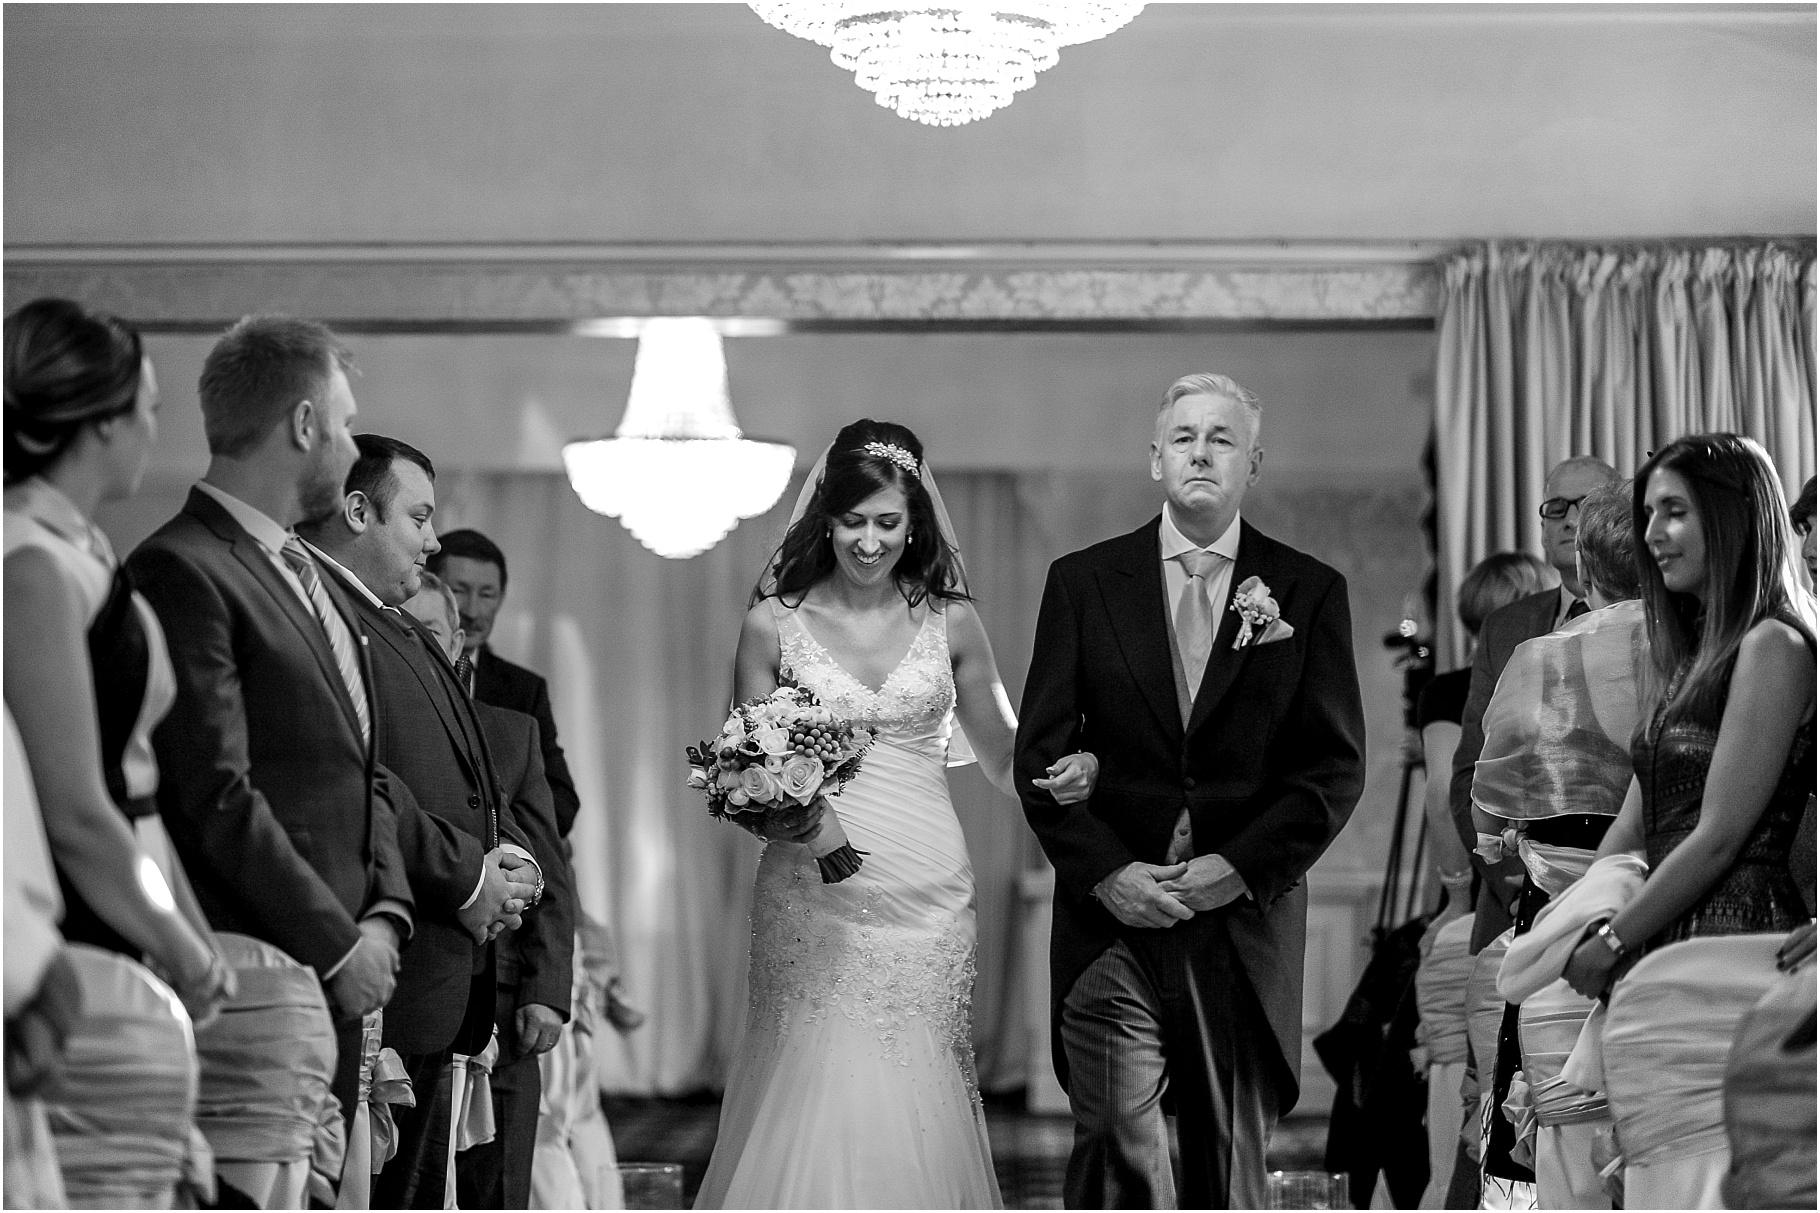 bartle-hall-wedding-29.jpg